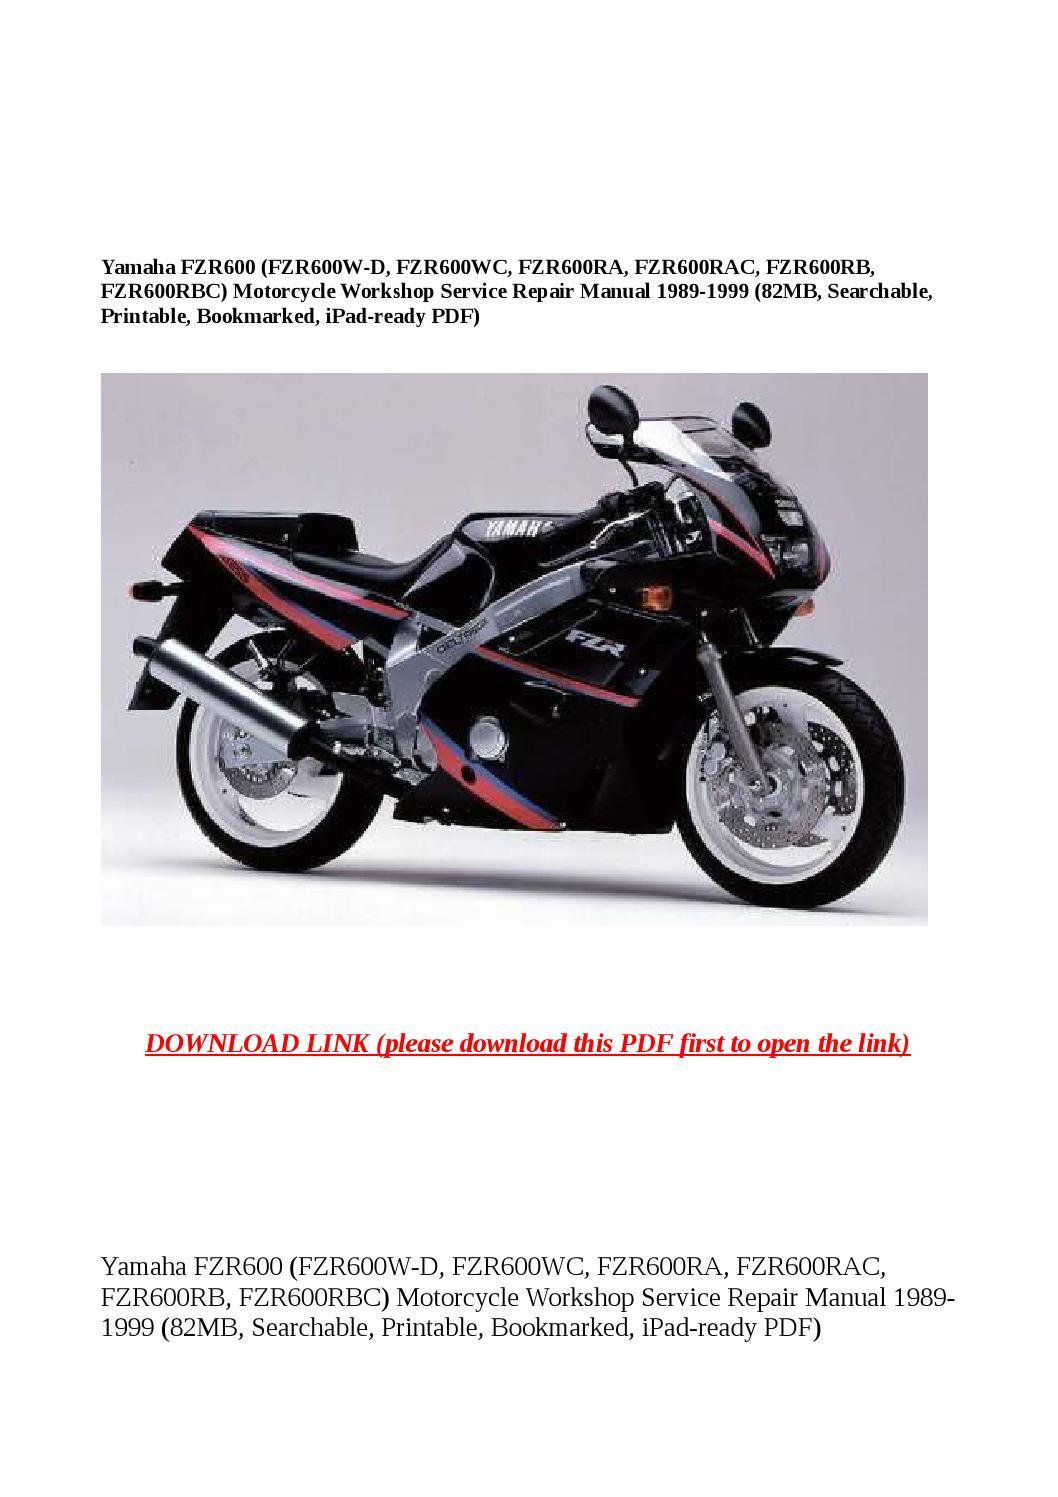 Yamaha fzr600 (fzr600w d, fzr600wc, fzr600ra, fzr600rac, fzr600rb,  fzr600rbc) motorcycle workshop se by buhbu - issuu